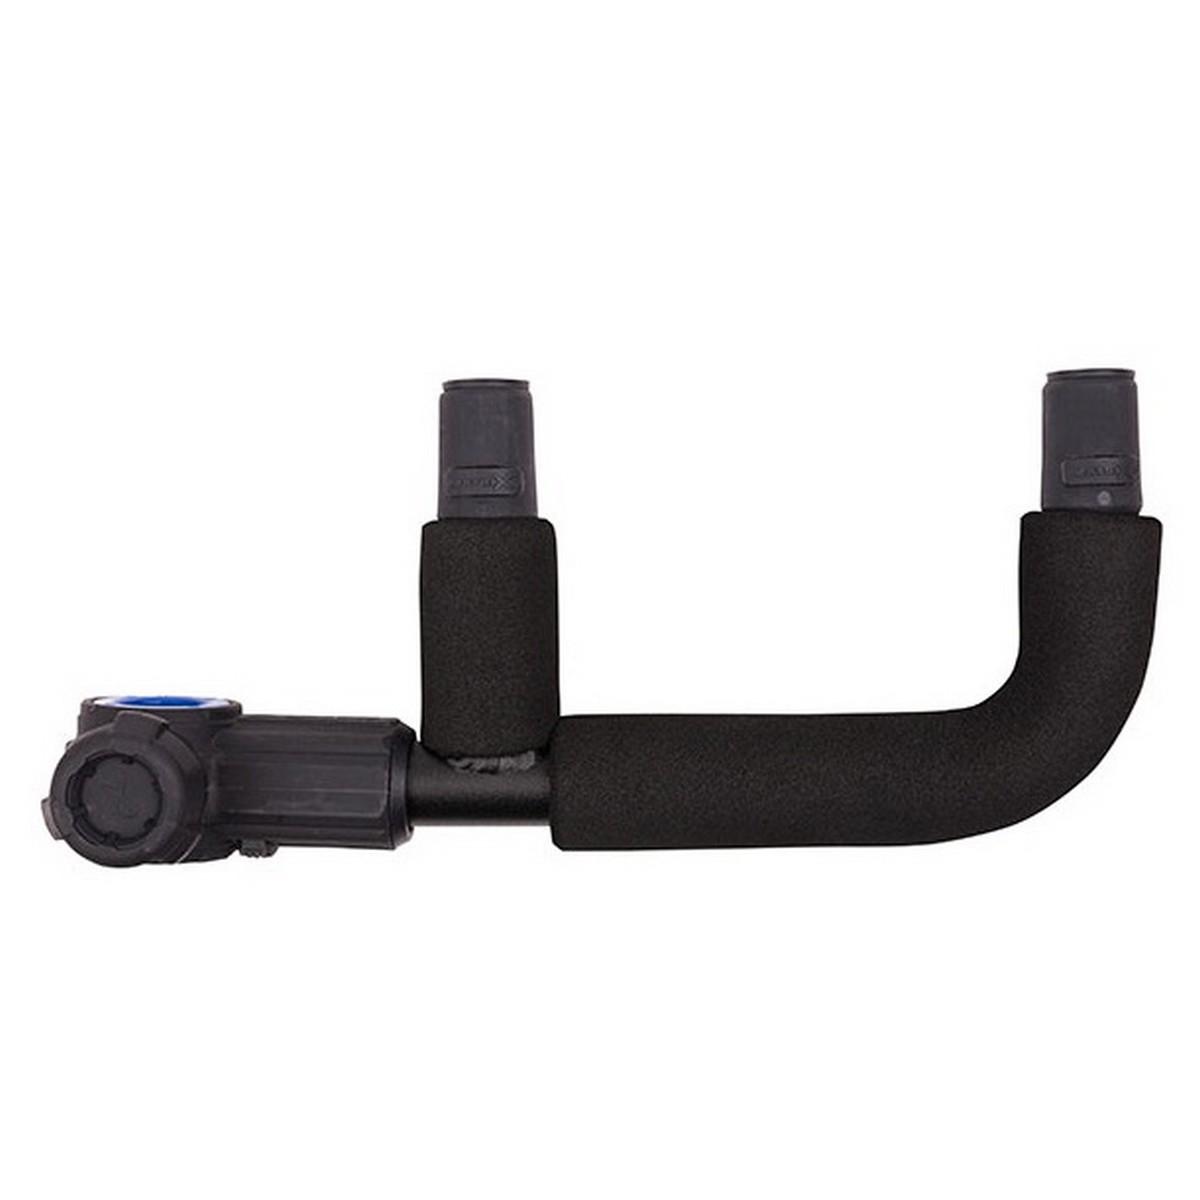 Прикачна за платформа Matrix 3D-R Double Protector Bar Short - универсално двойно късо рамо